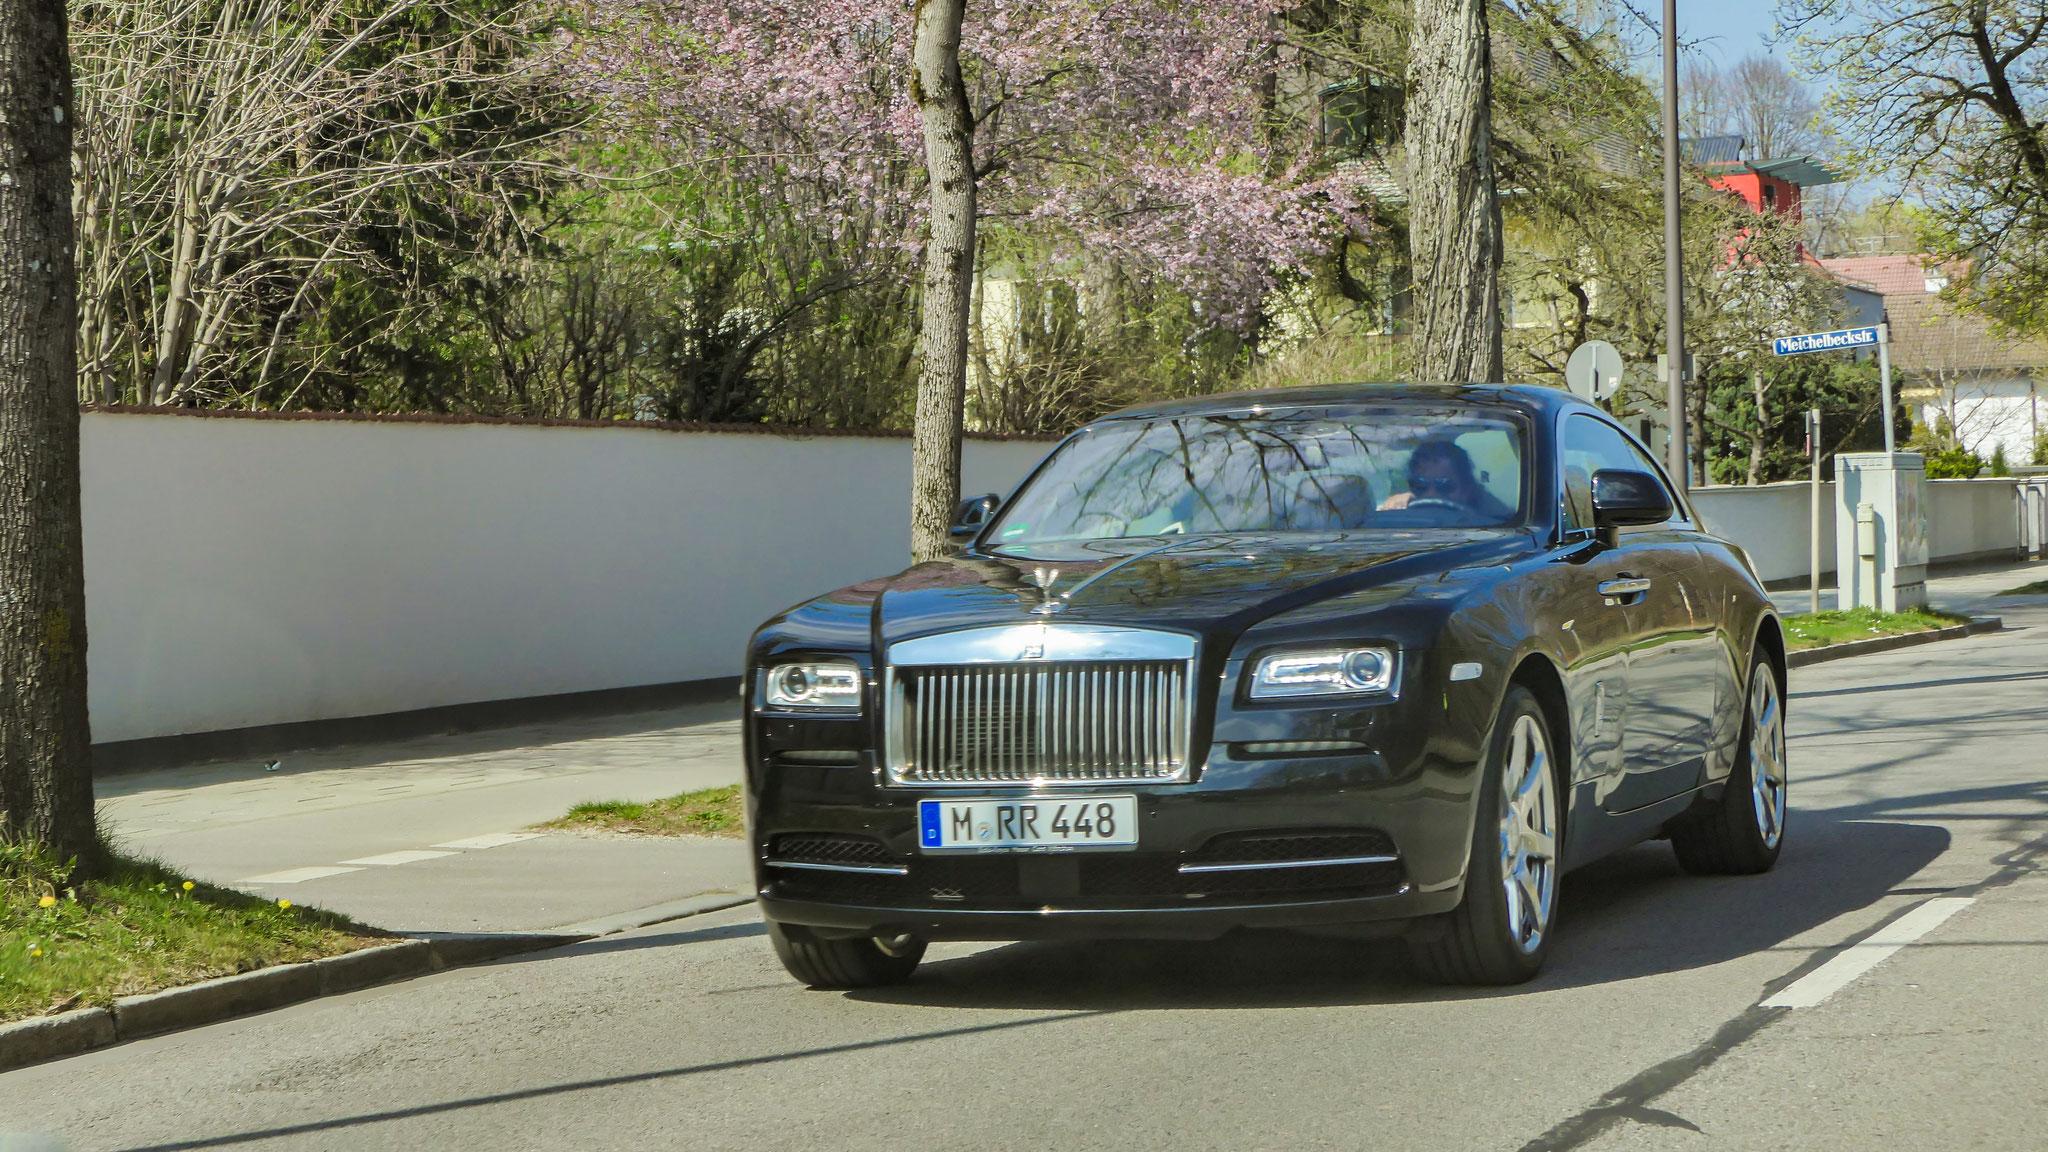 Rolls Royce Wraith - M-RR-448